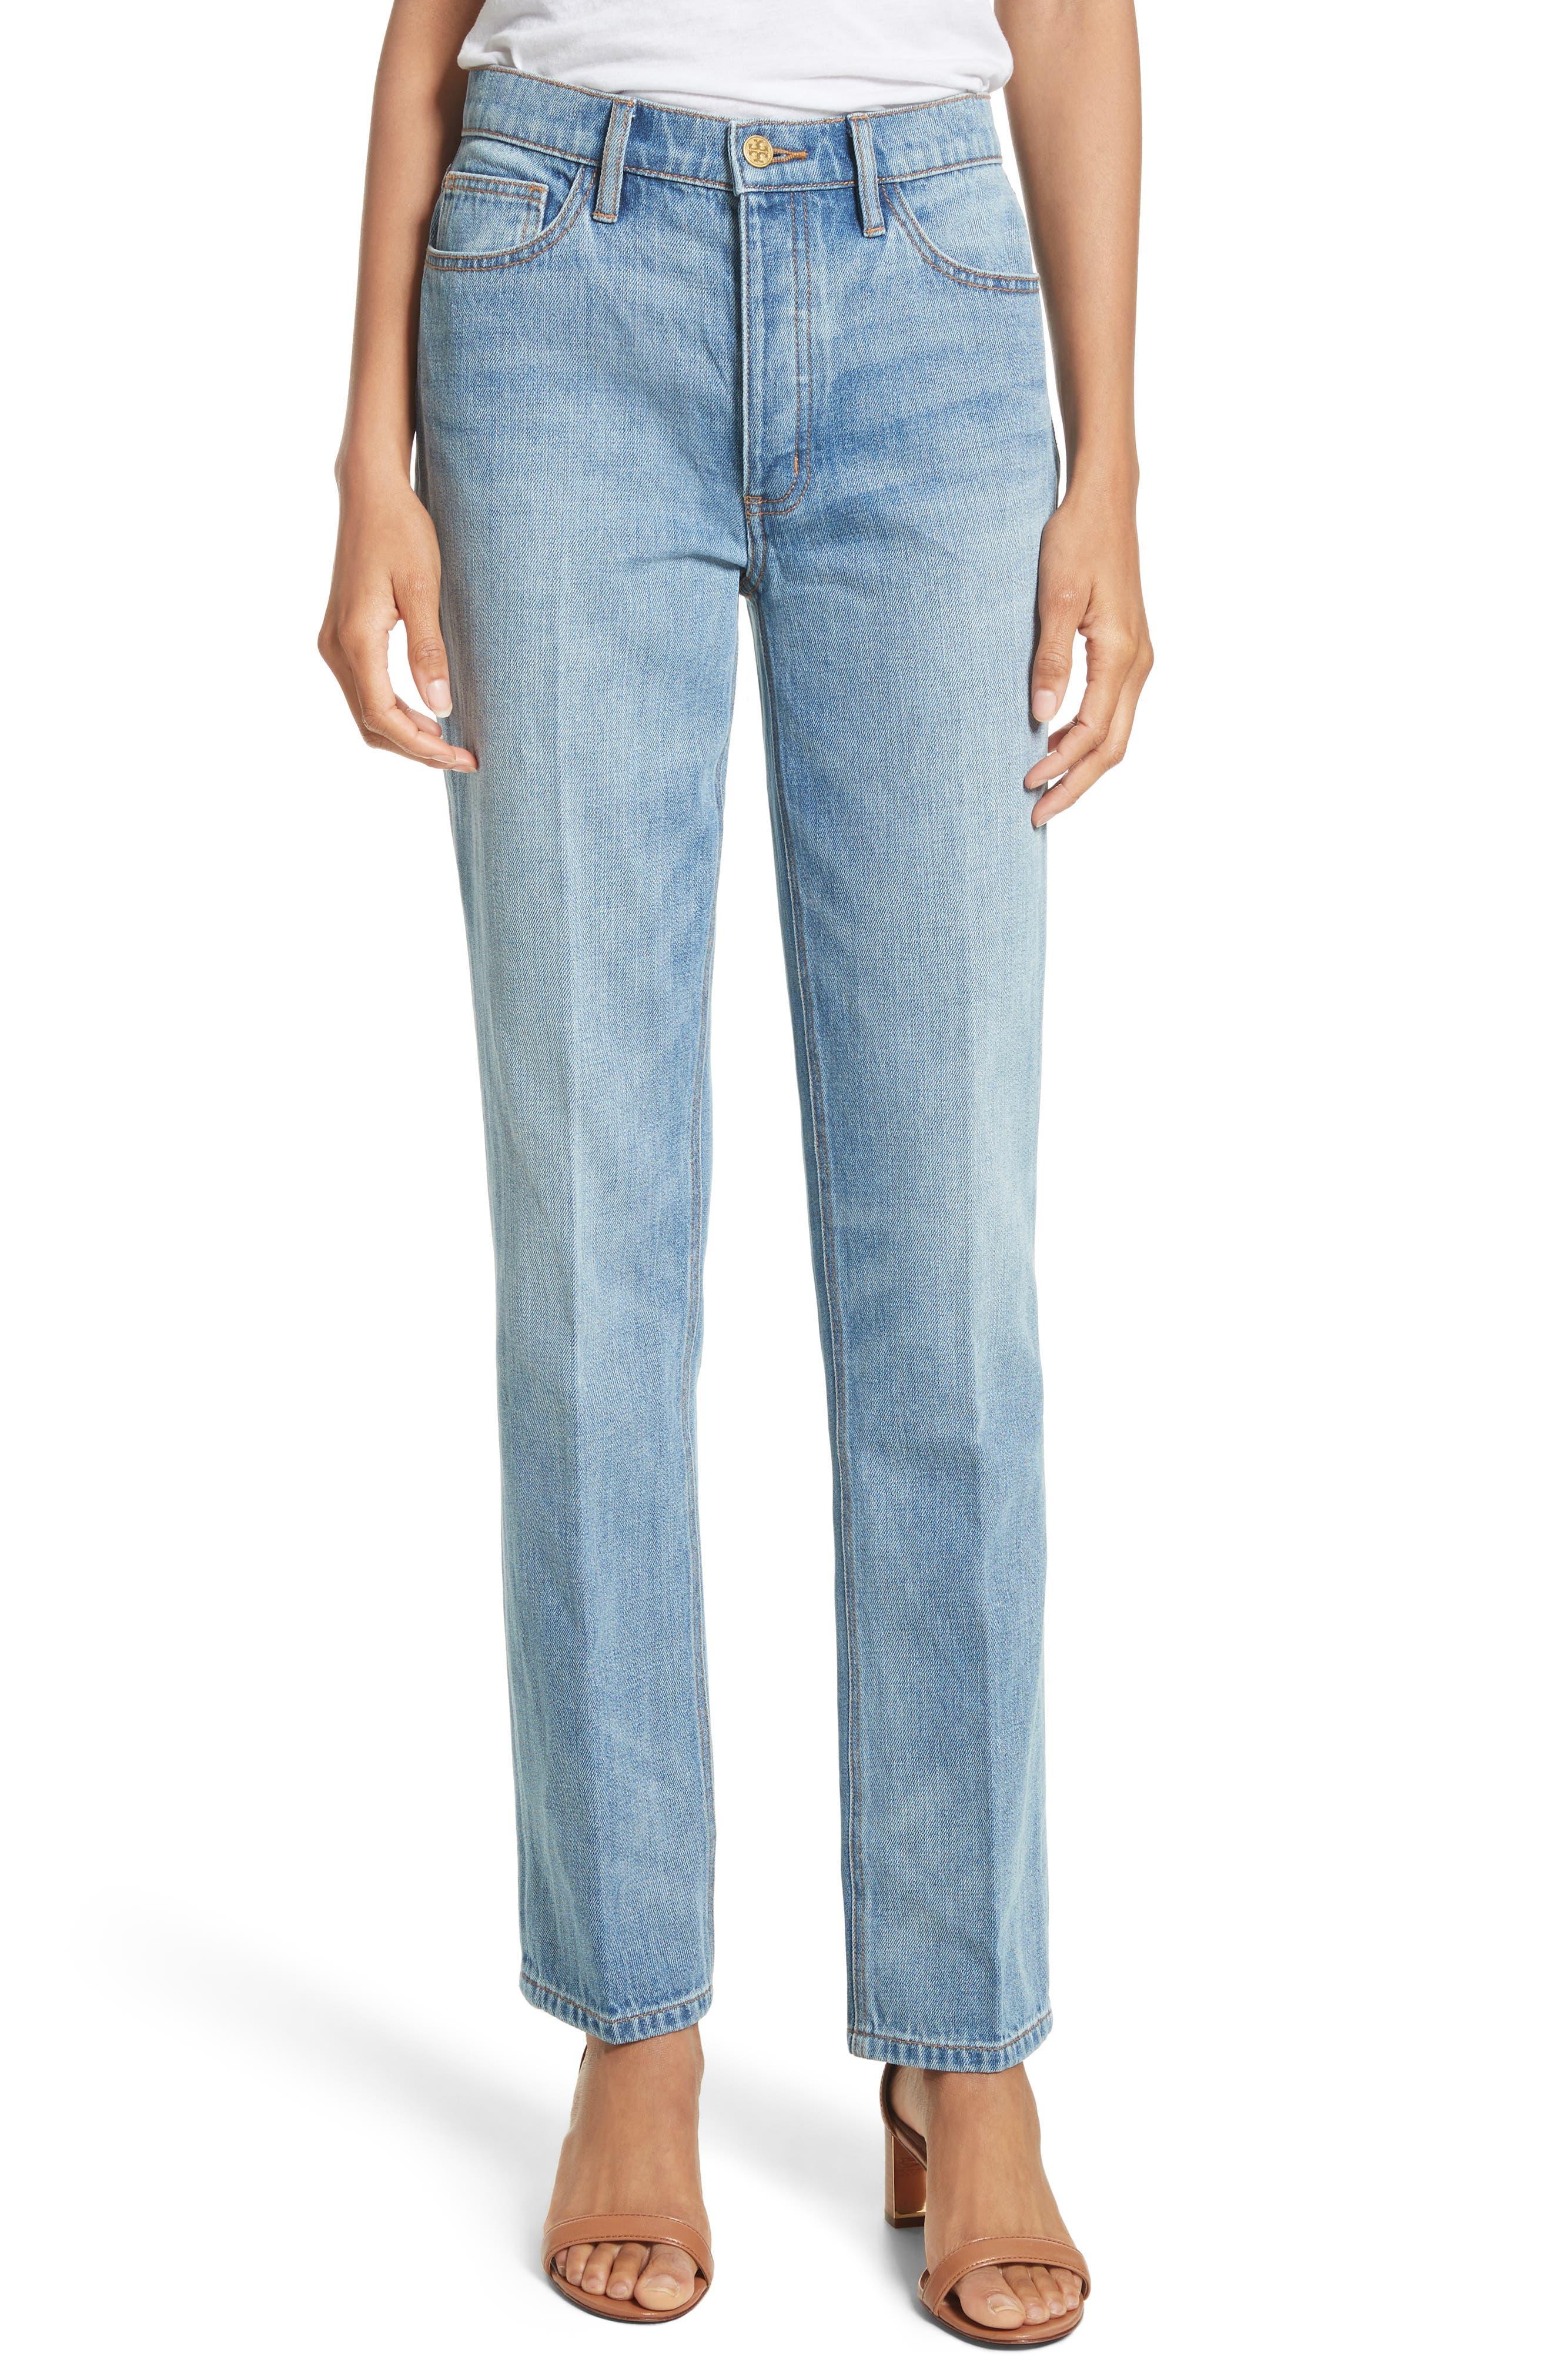 Tory Burch Betsy Straight Leg Jeans (Dusk Blue)